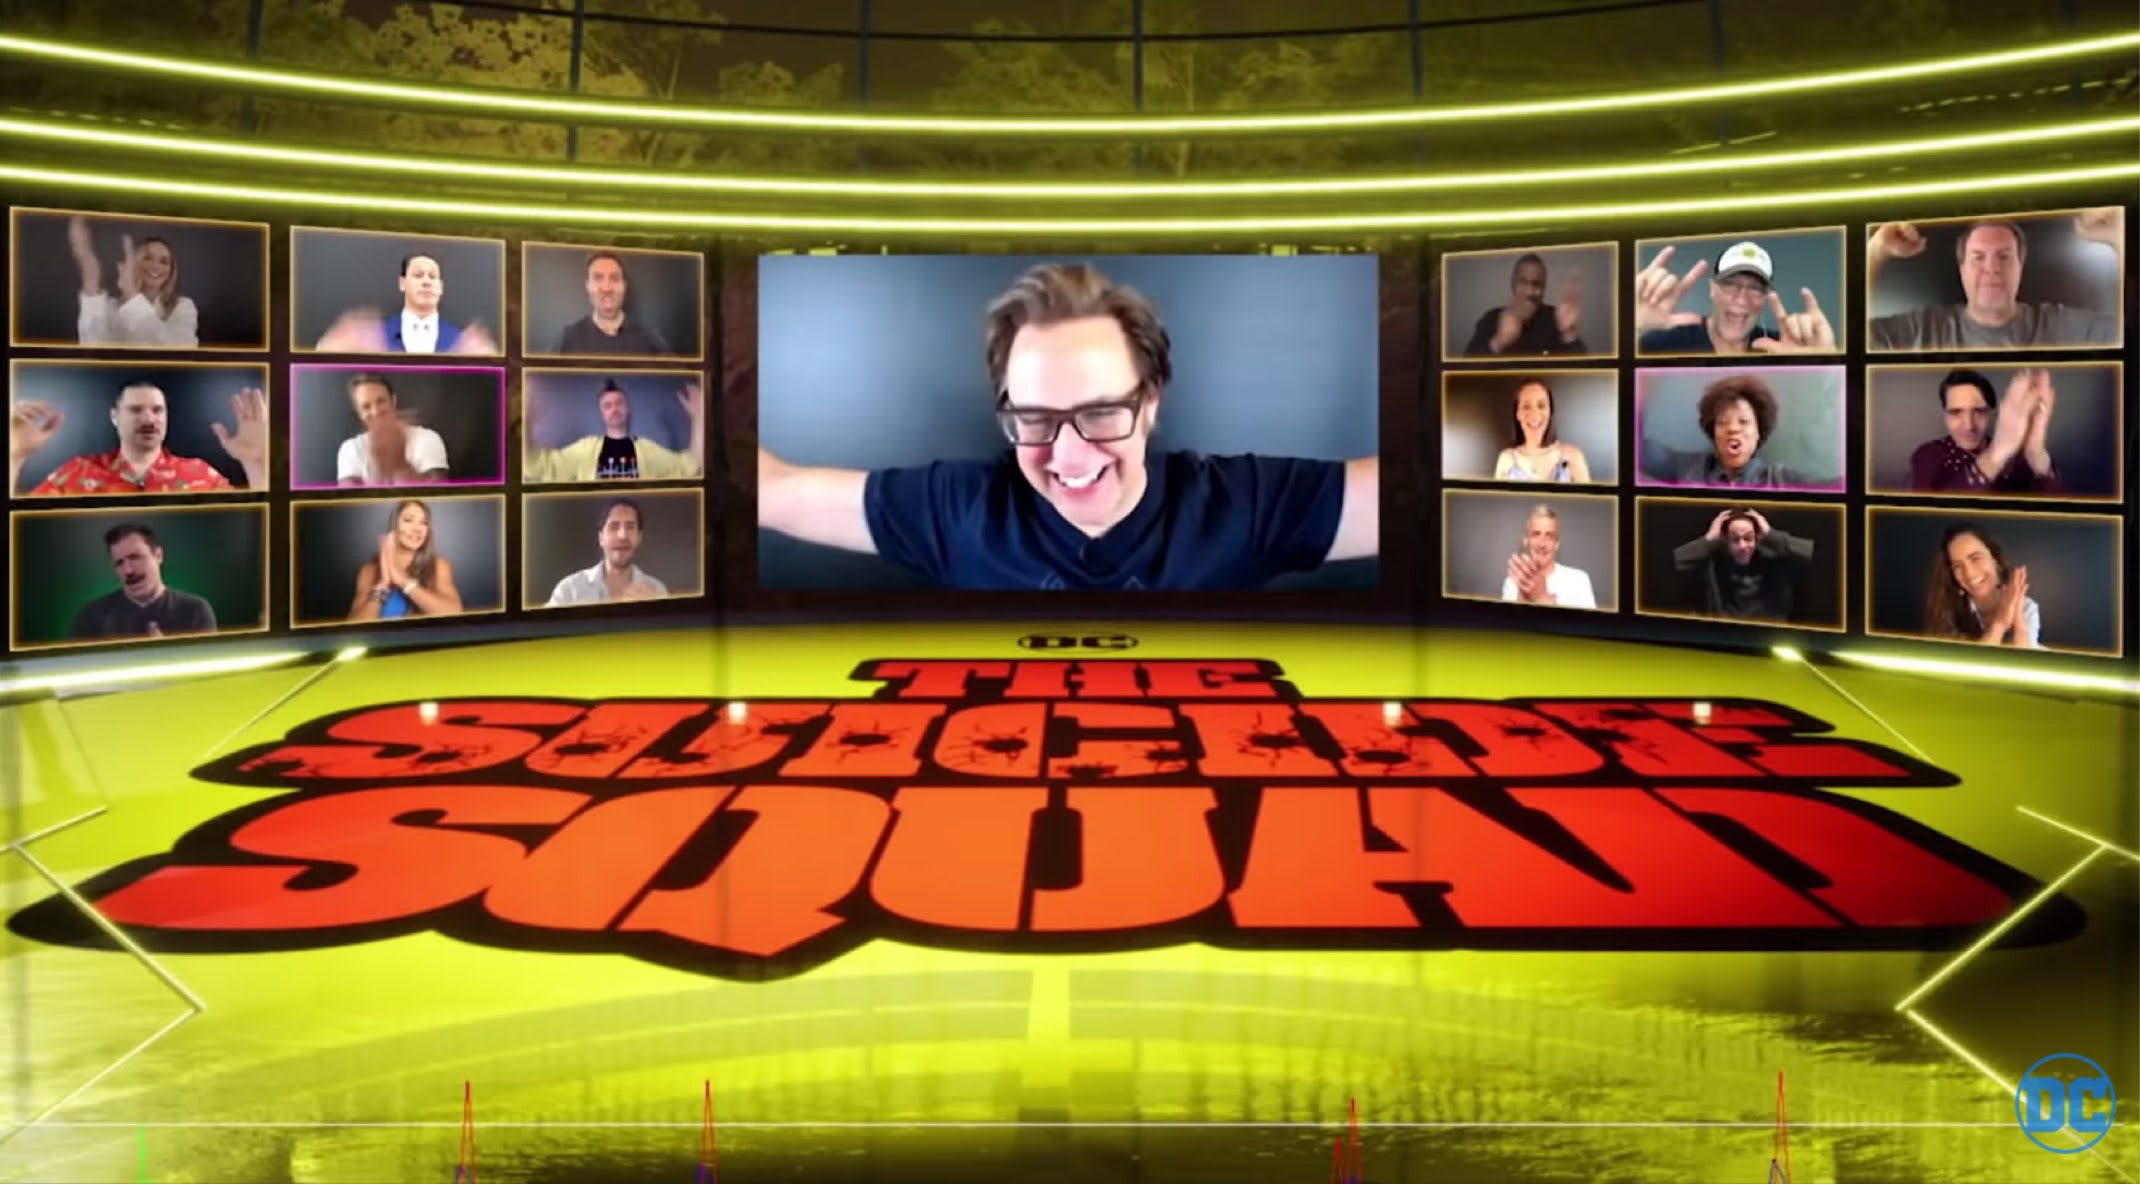 James Gunn Provides Glimpse of DC FanDome's 'The Suicide Squad' Panel